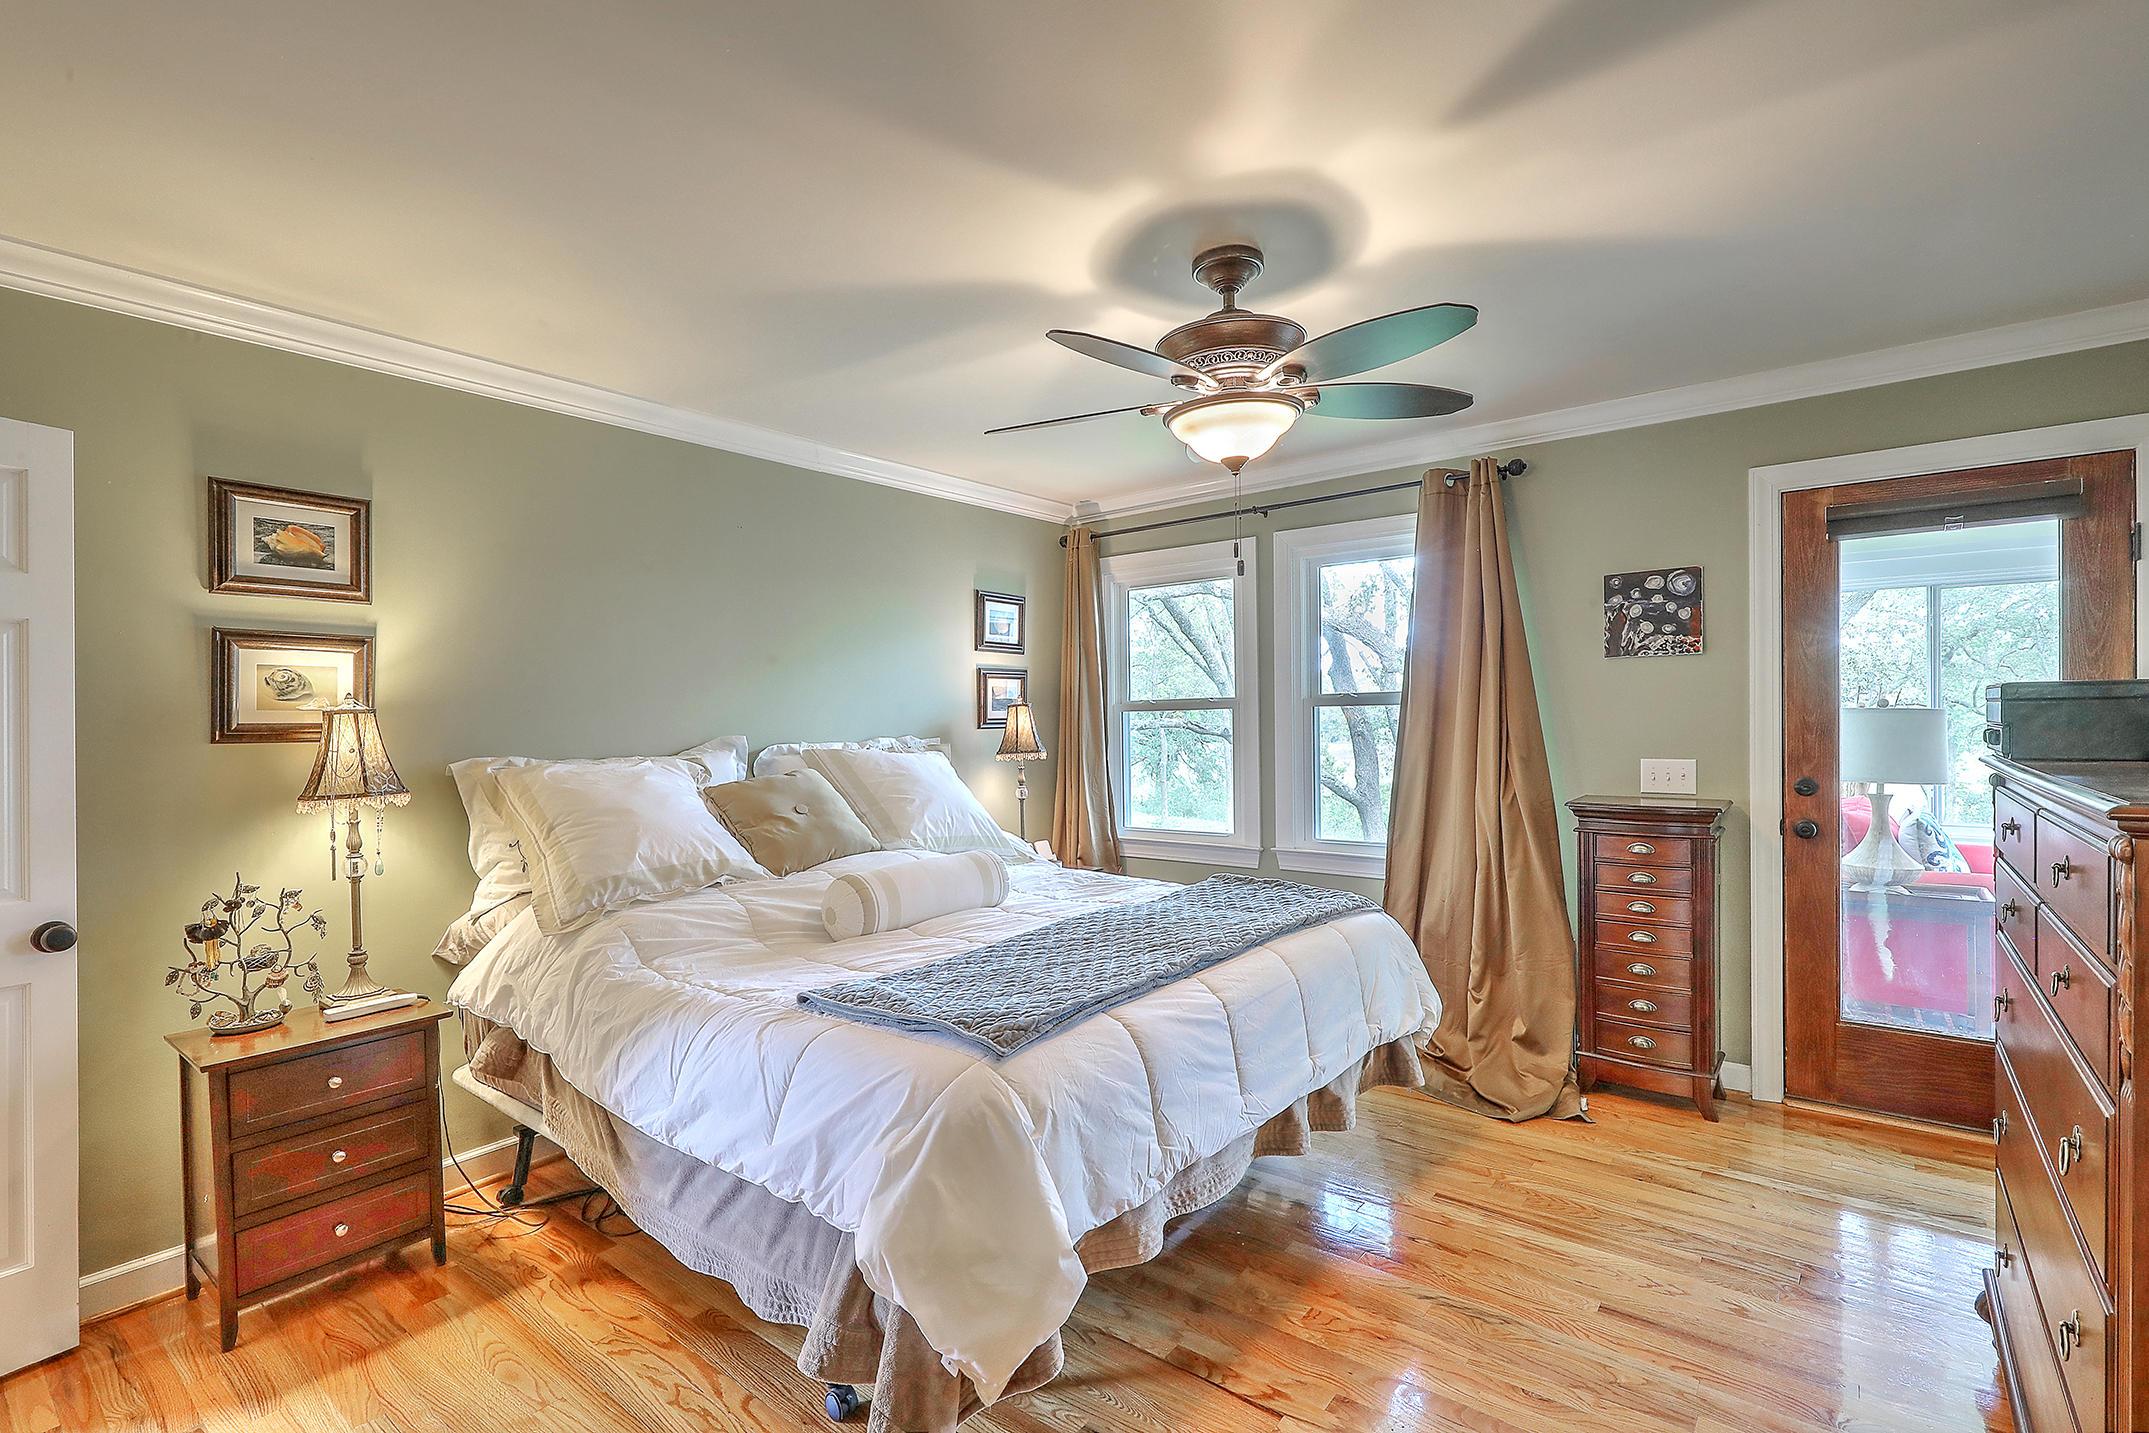 Stono Pointe Homes For Sale - 2660 Burden Creek, Johns Island, SC - 36